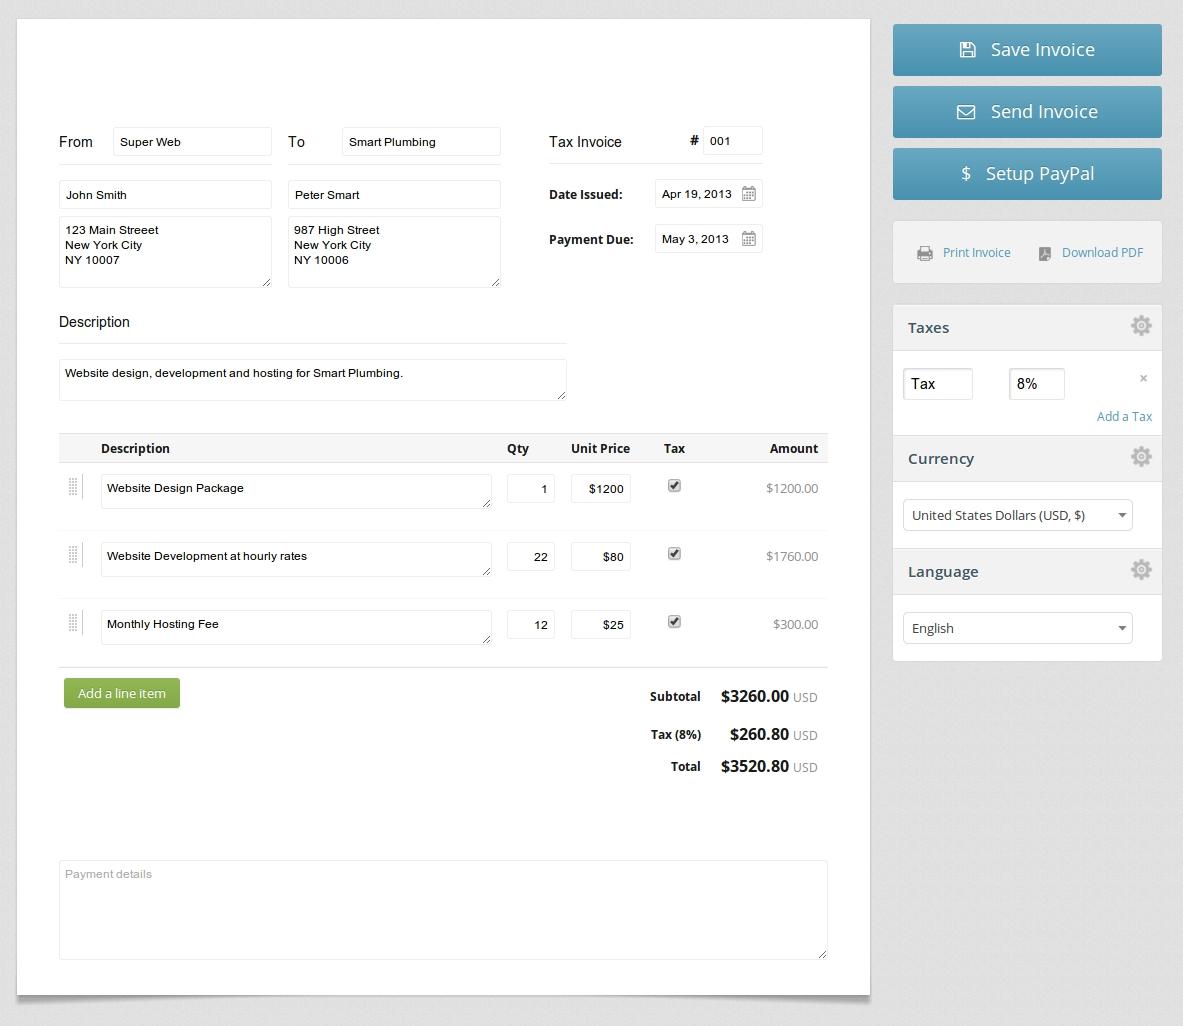 create invoice free create invoice online free accounting tool create invoice free online